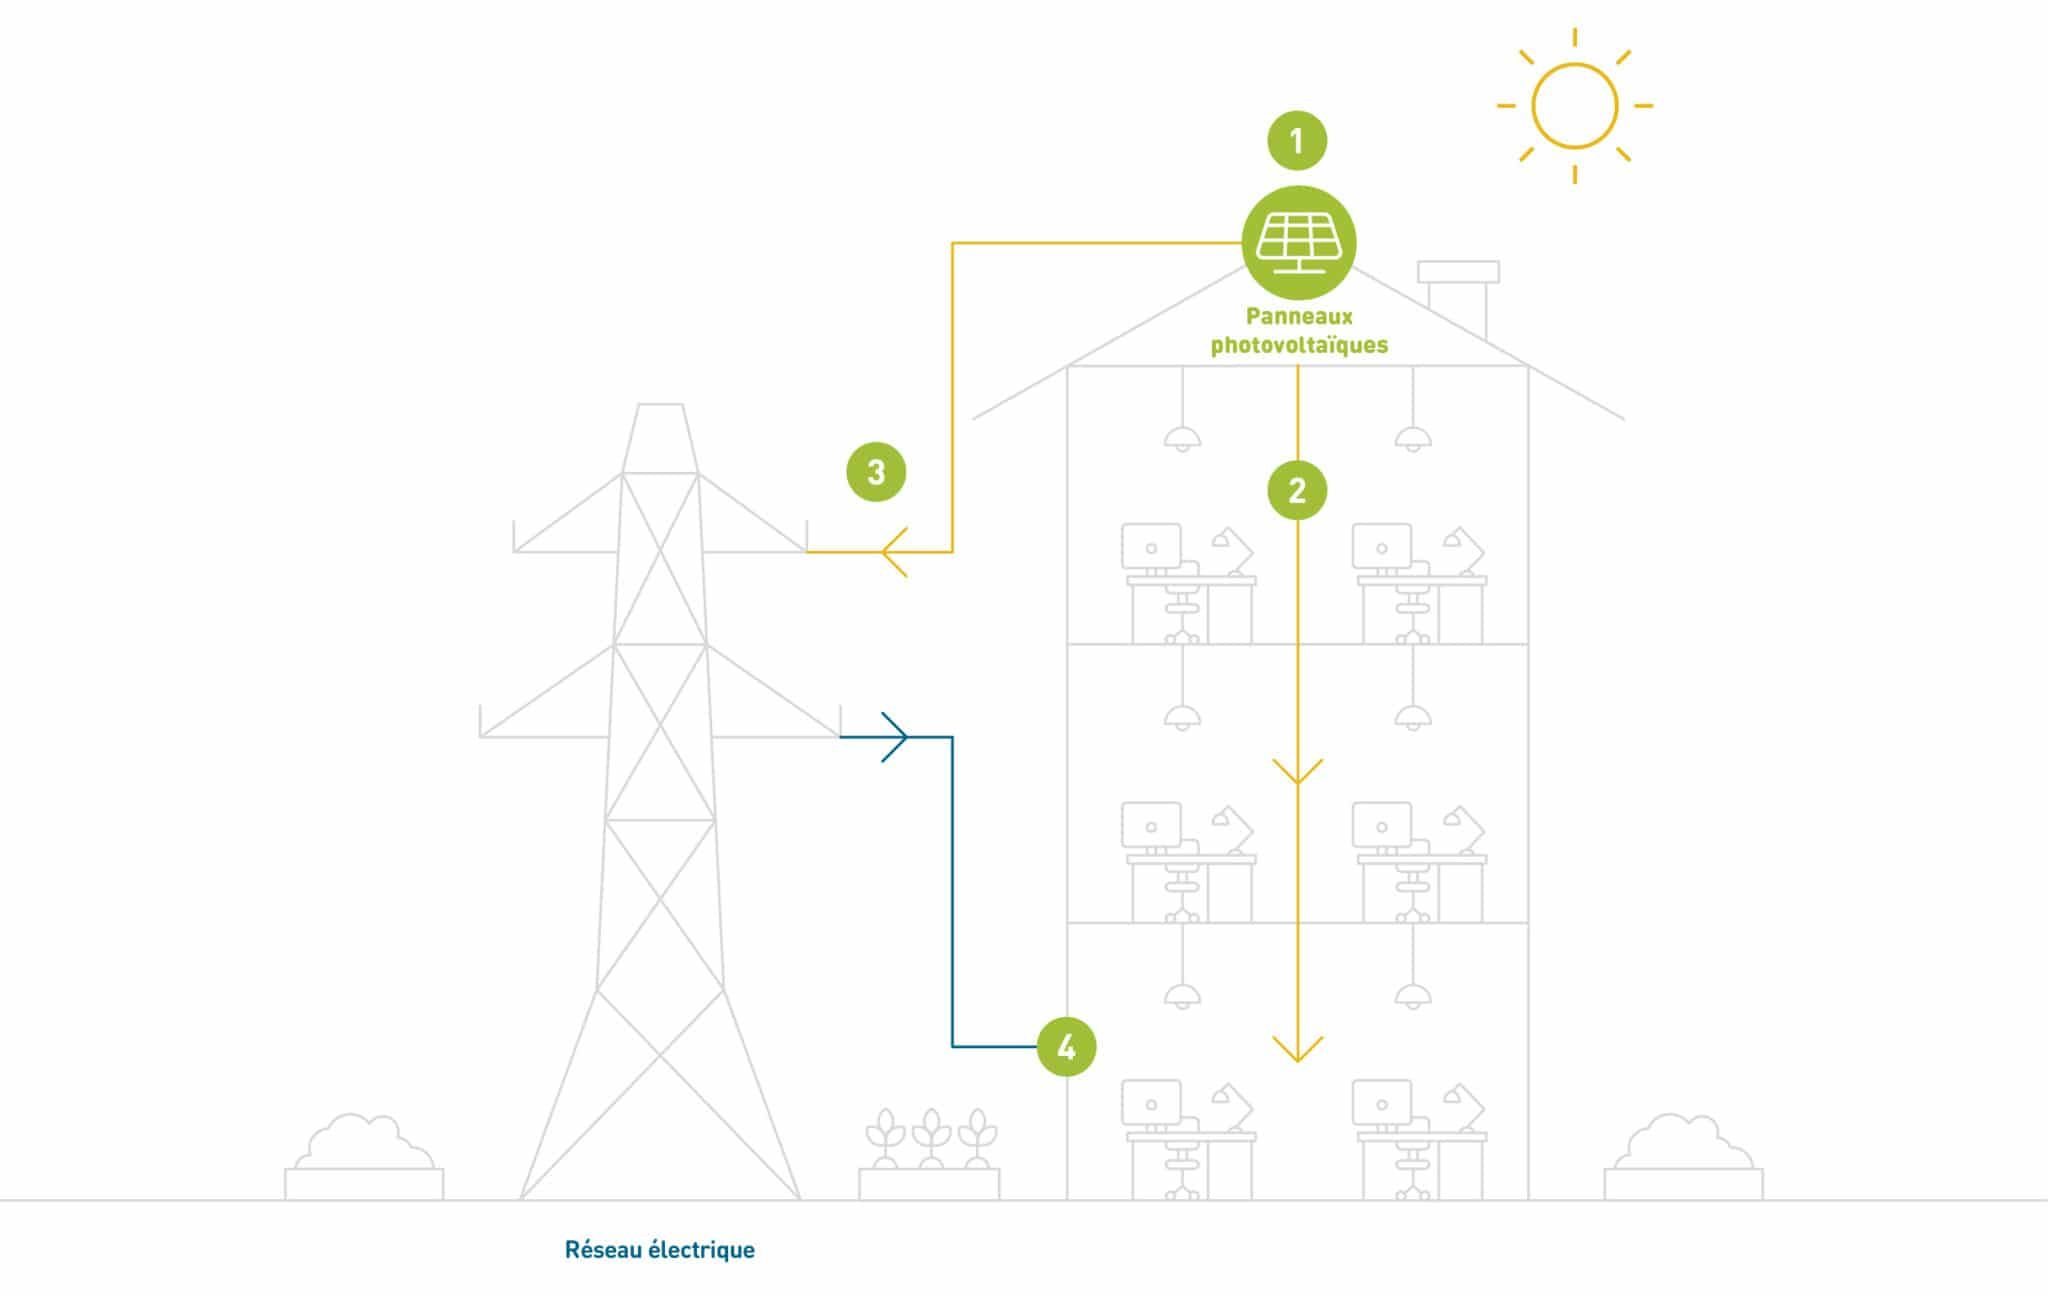 Contracting photovoltaïque